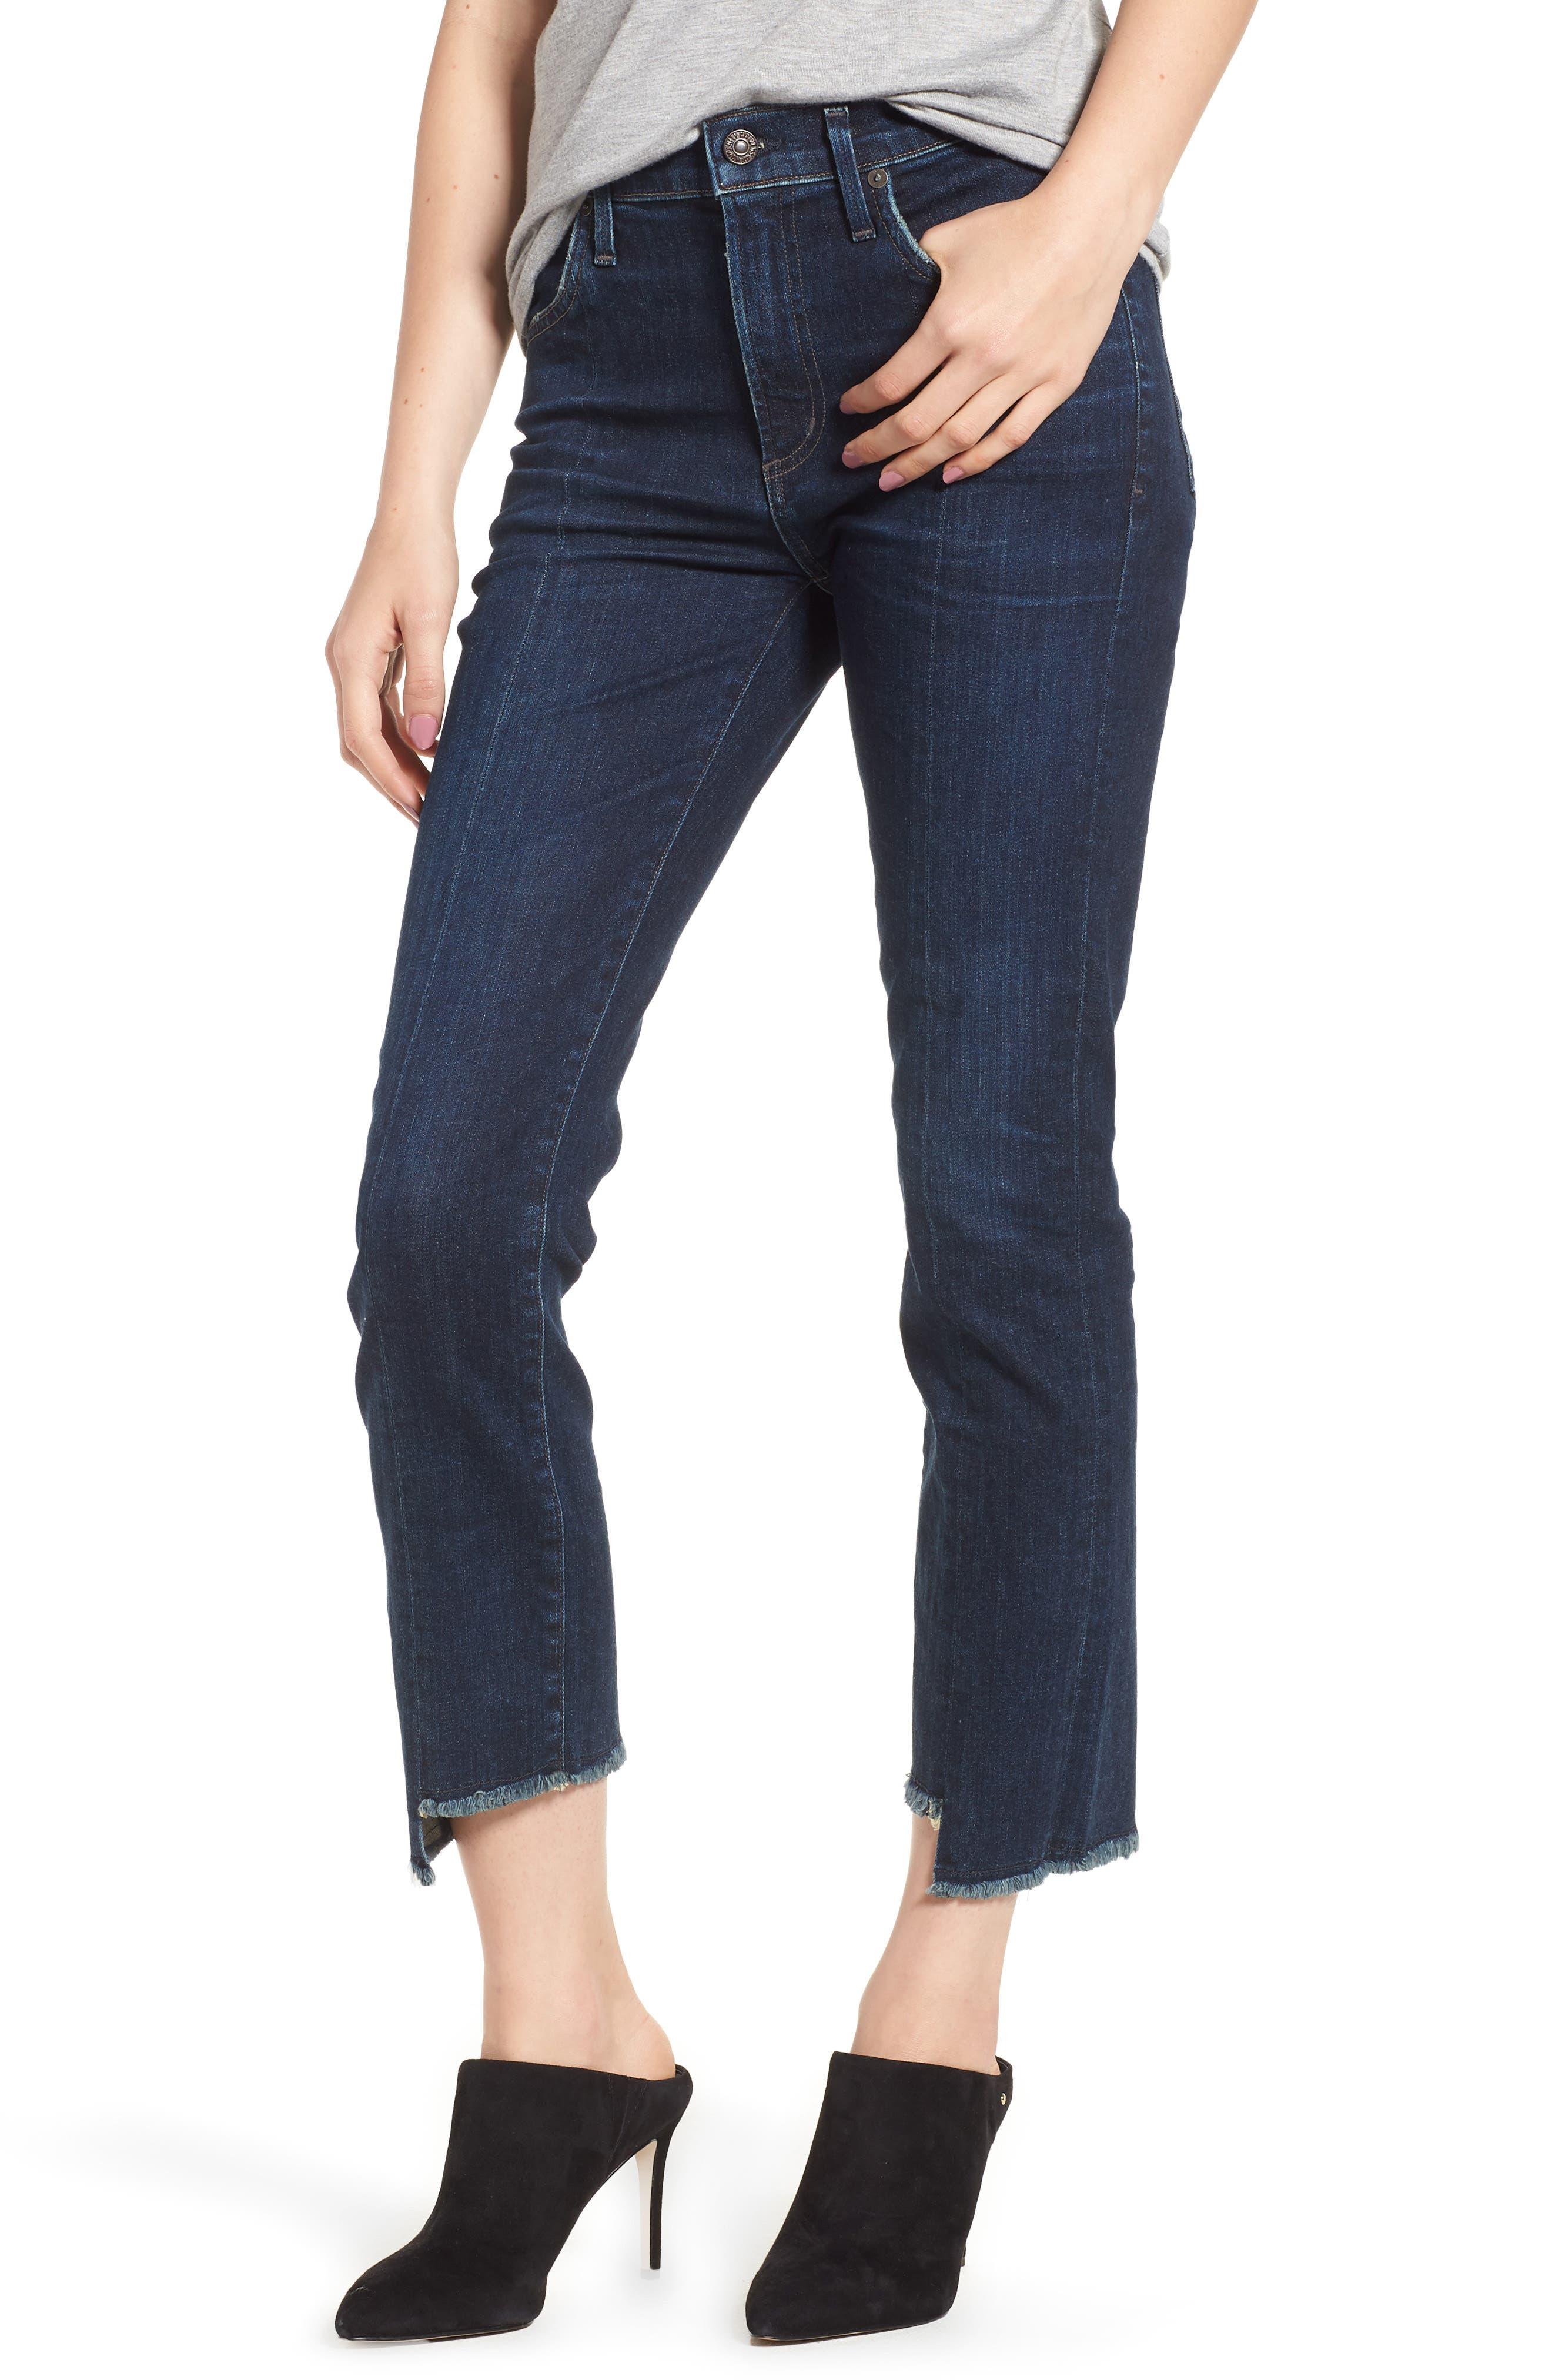 Amari Ankle Skinny Jeans,                             Main thumbnail 1, color,                             401